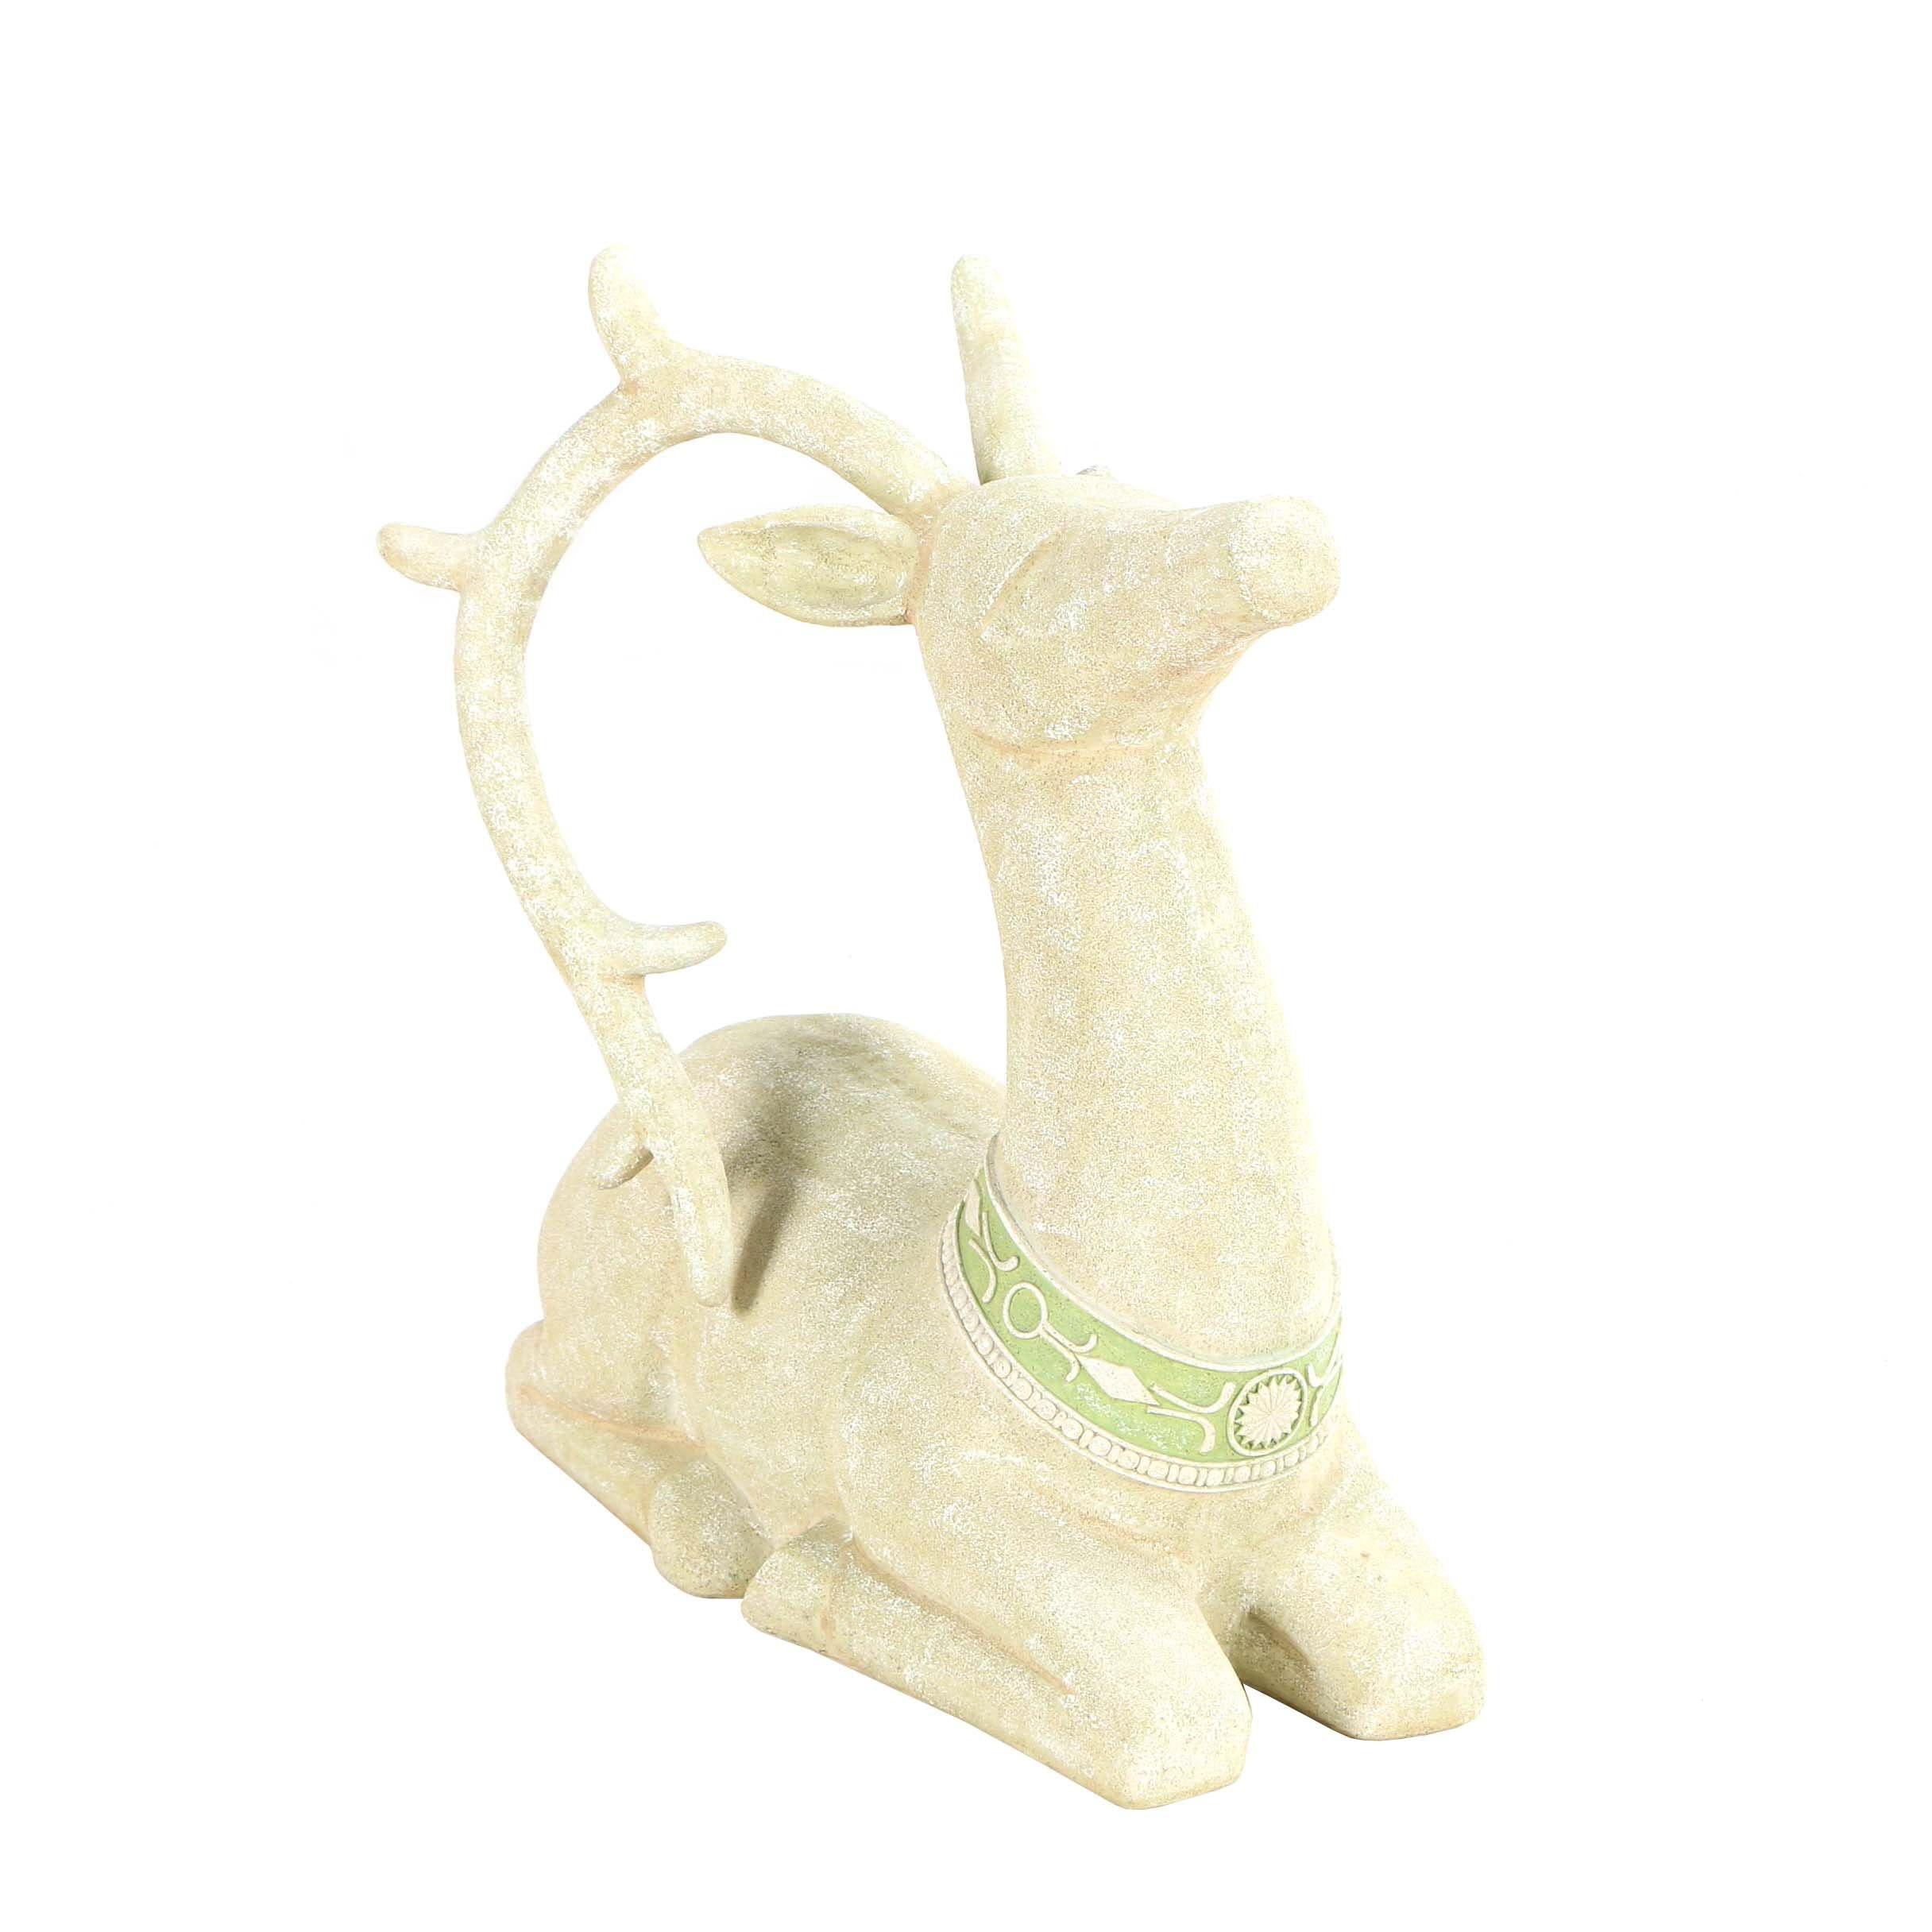 Grasslands Road Resin Reindeer Statue